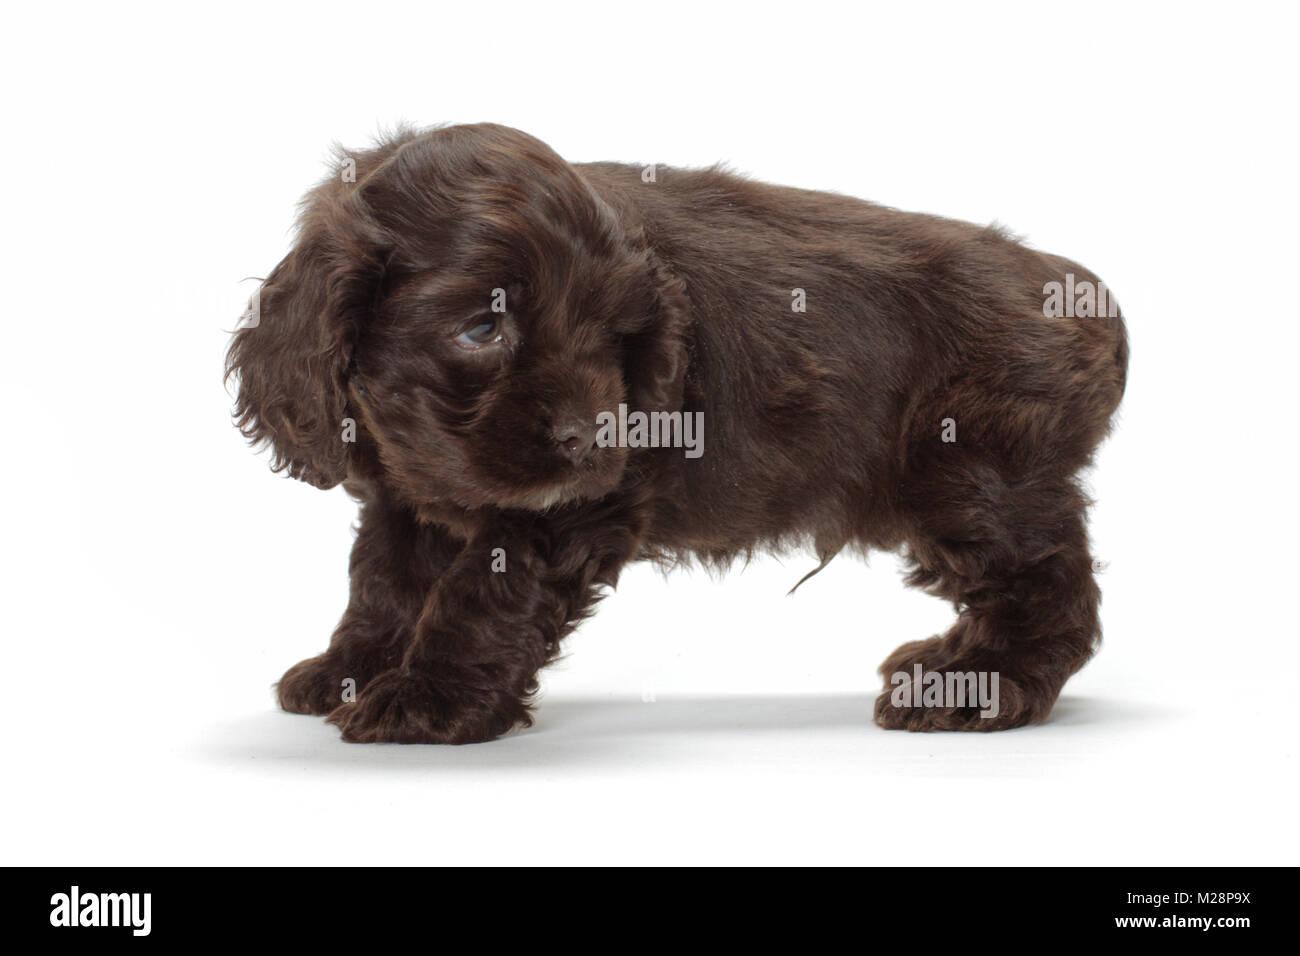 Chocolate American Cocker Spaniel Puppy On White Background Stock Photo Alamy